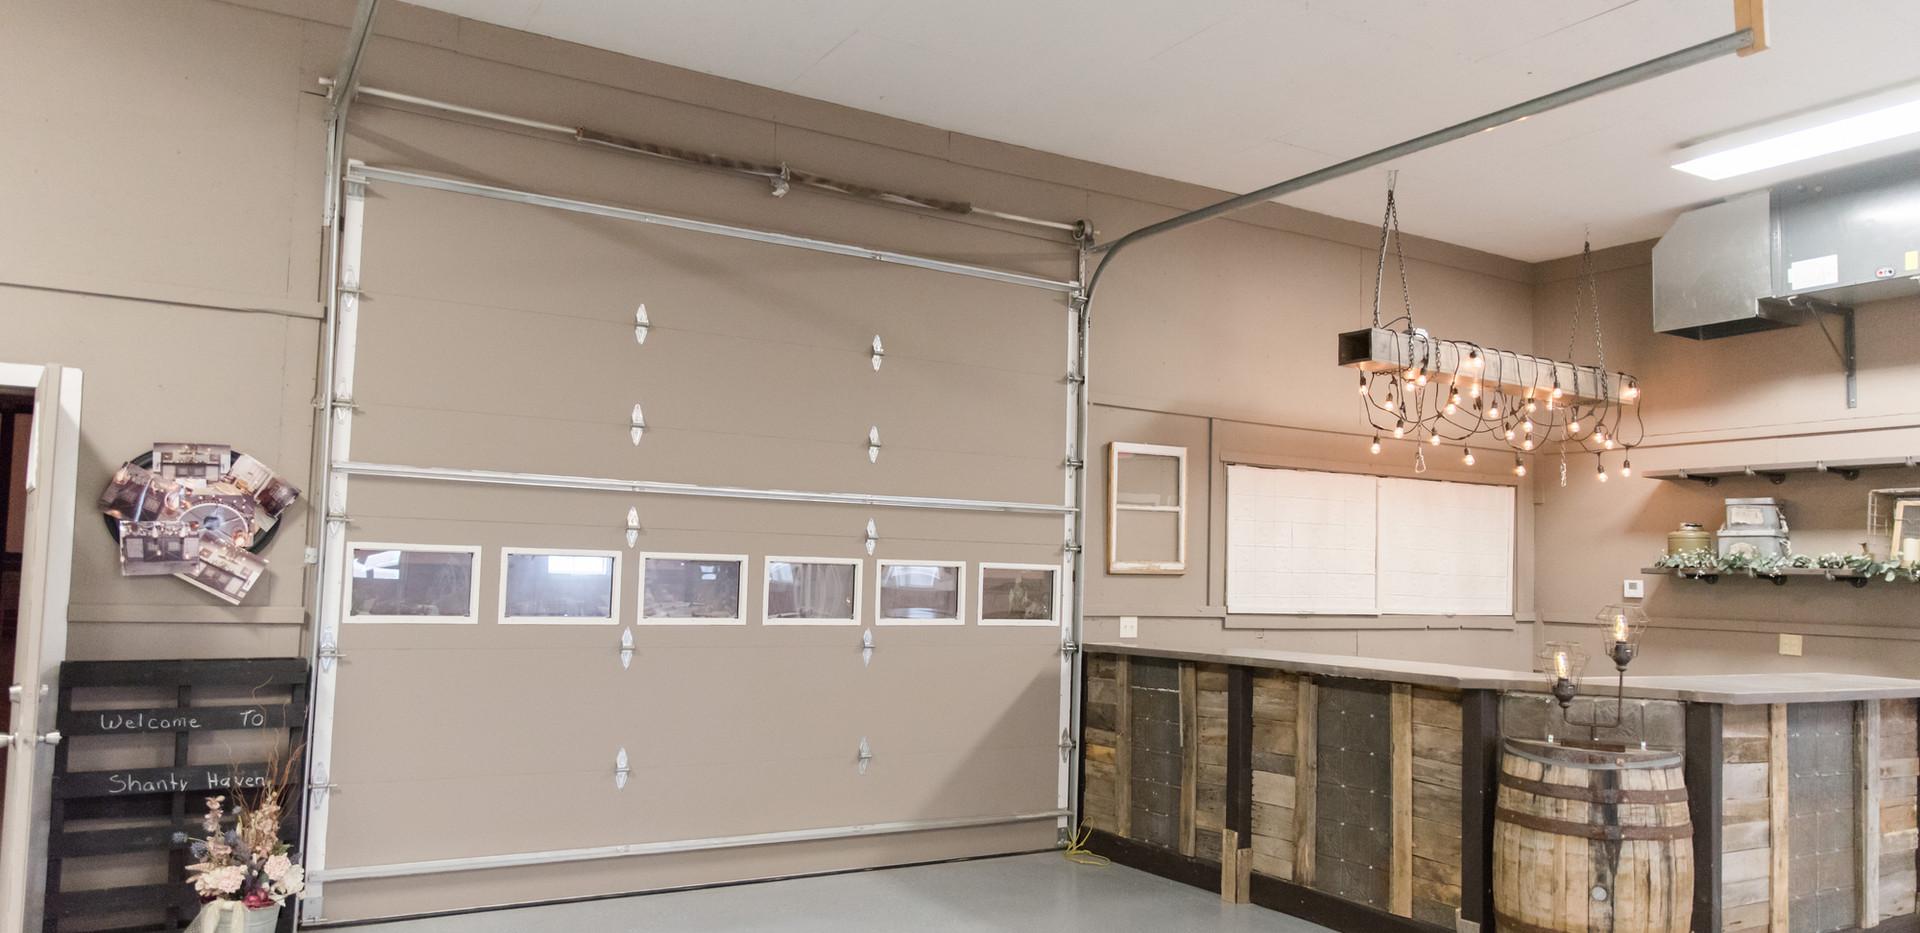 Rustic bar opens into Big Shanty